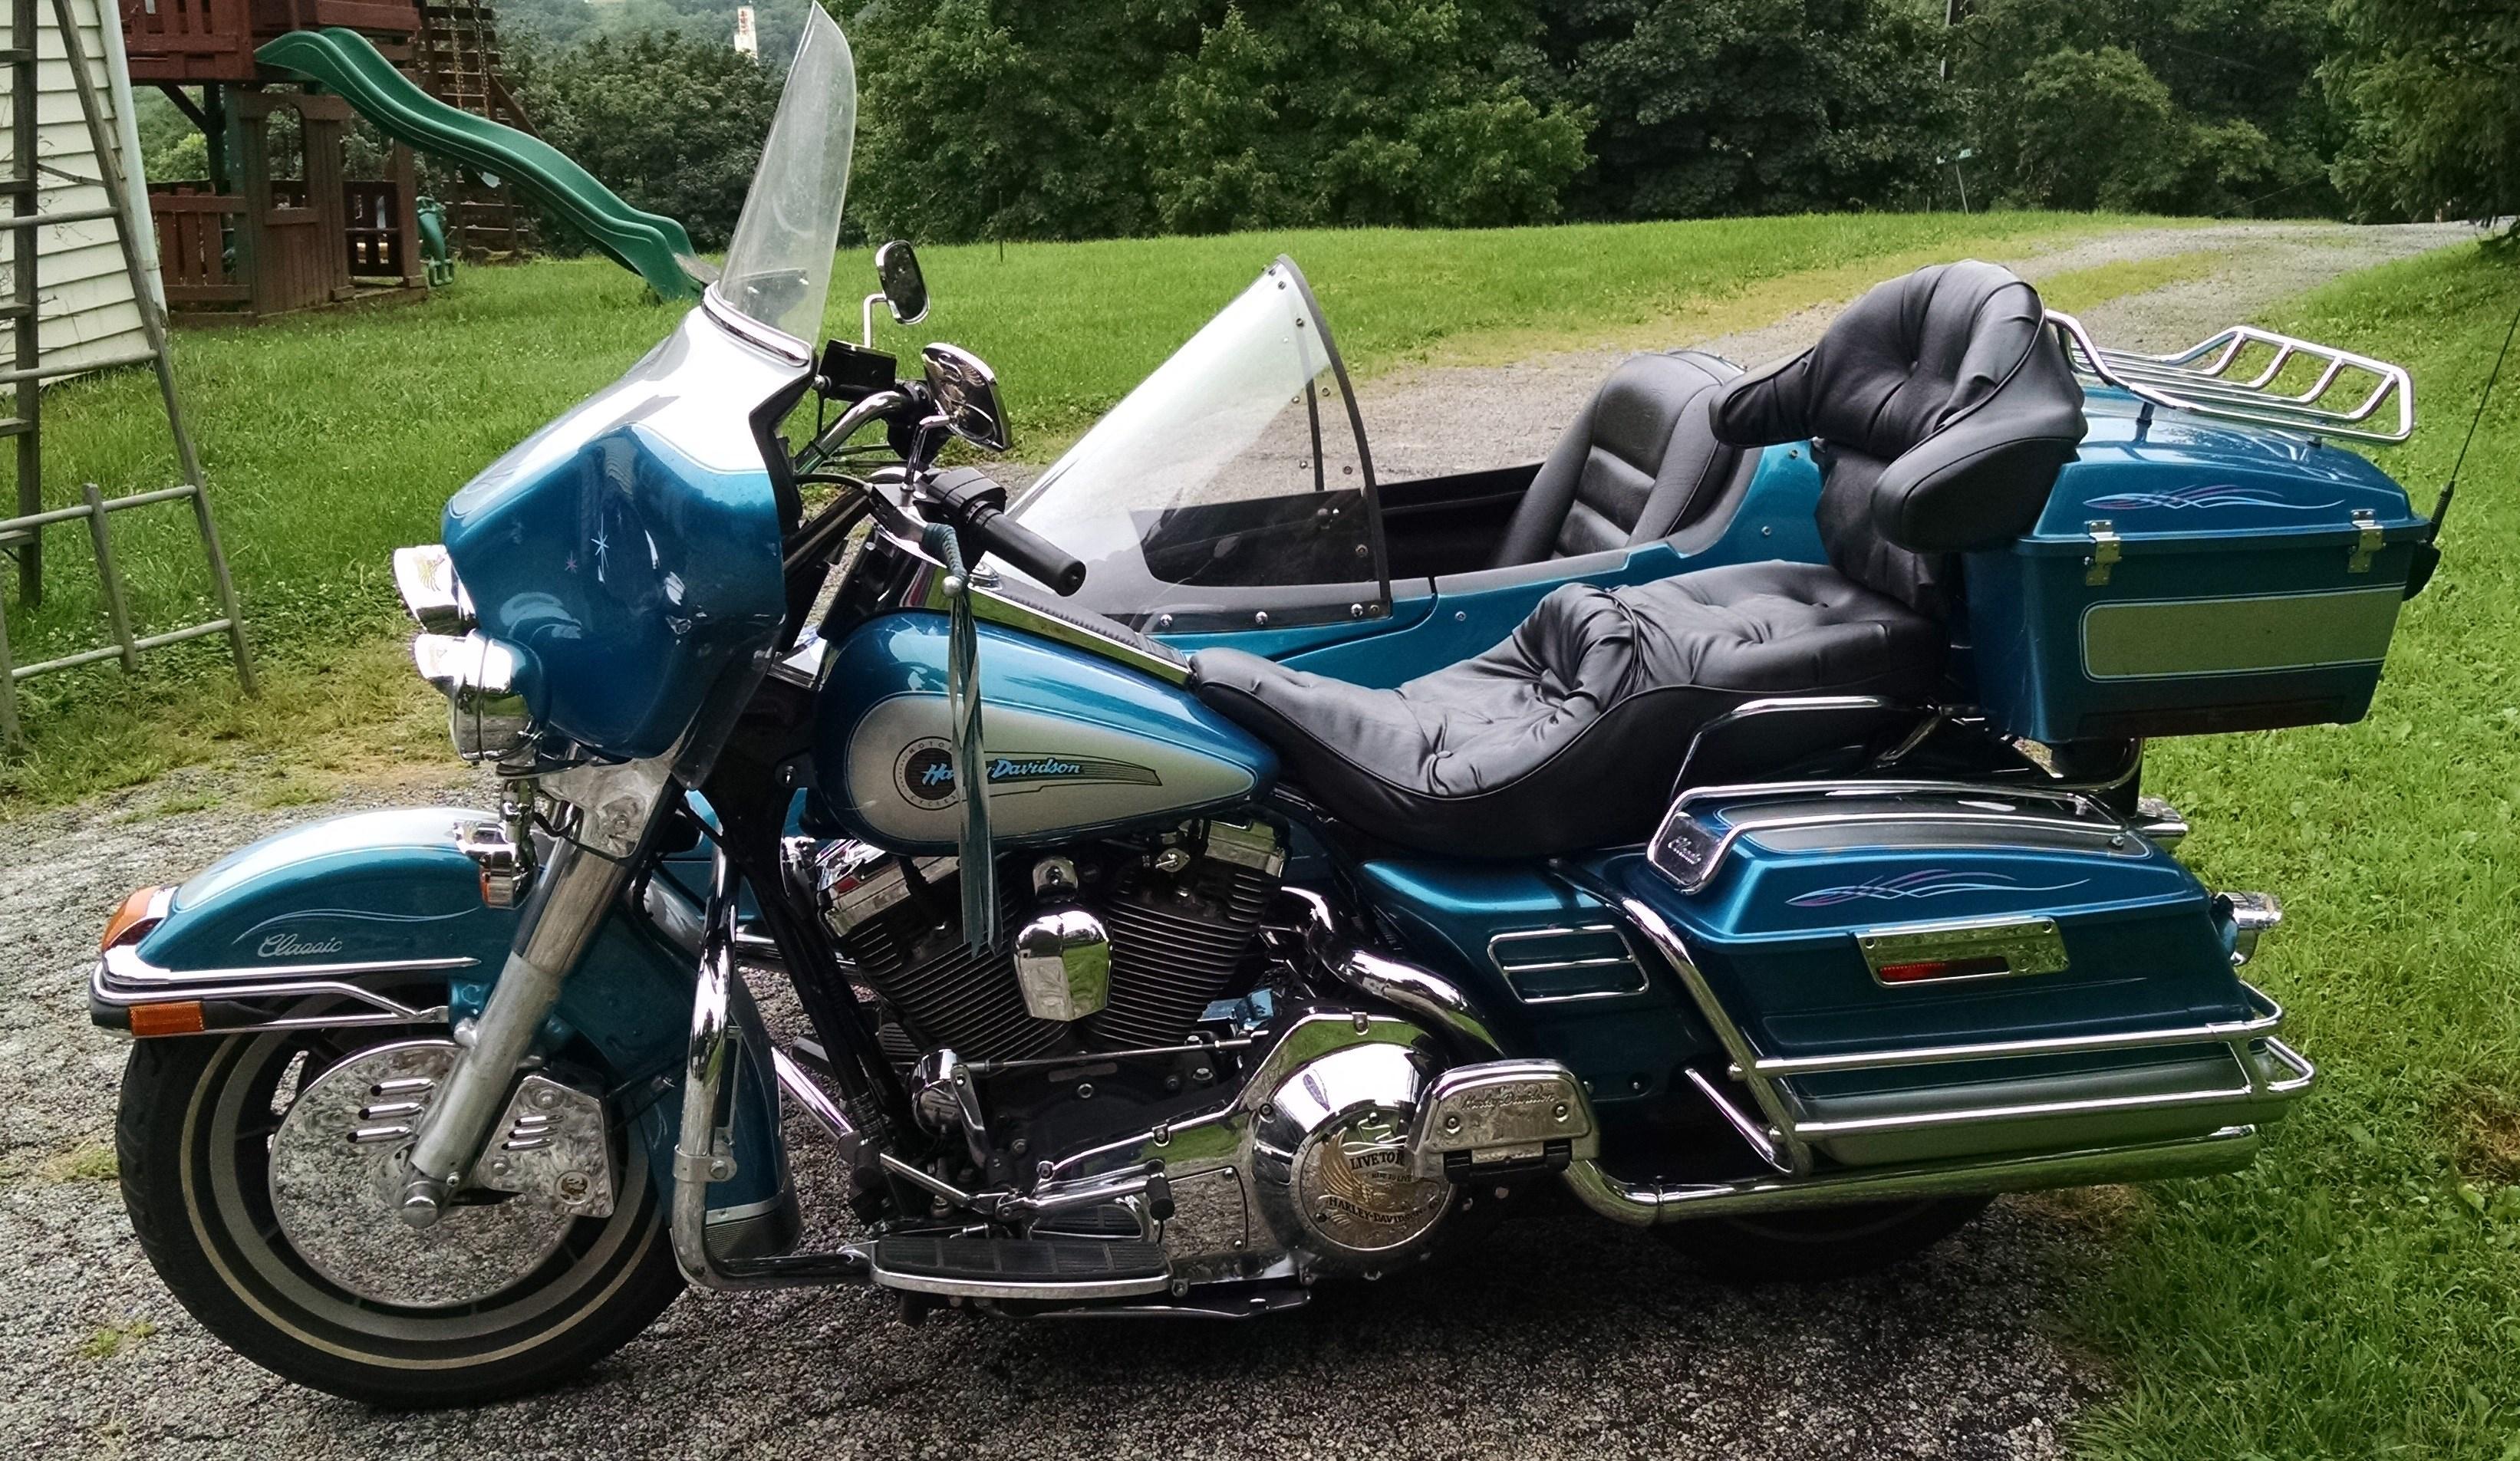 1994 Harley Davidson 174 Flhtc Electra Glide 174 Classic Teal